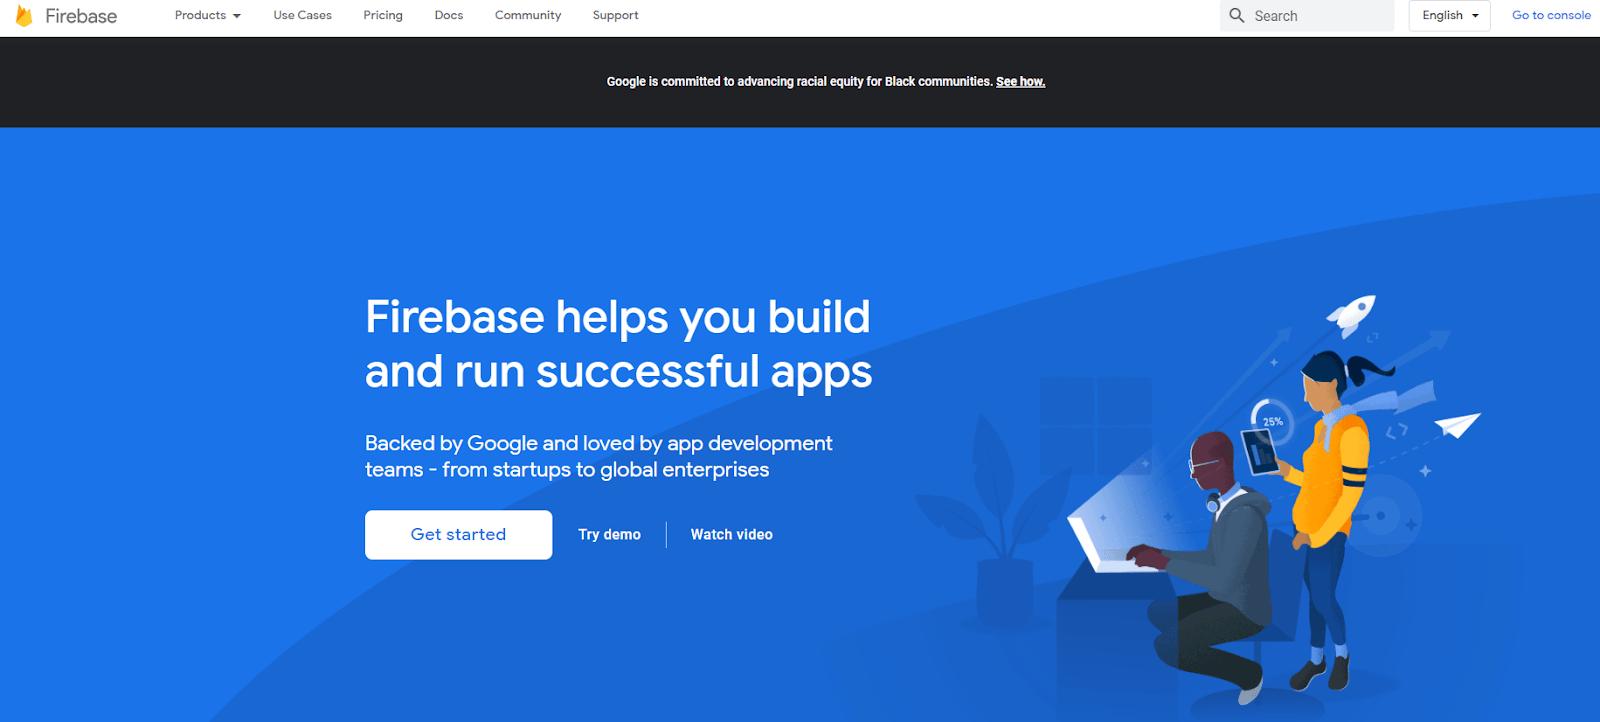 Firebase By Google Screenshot